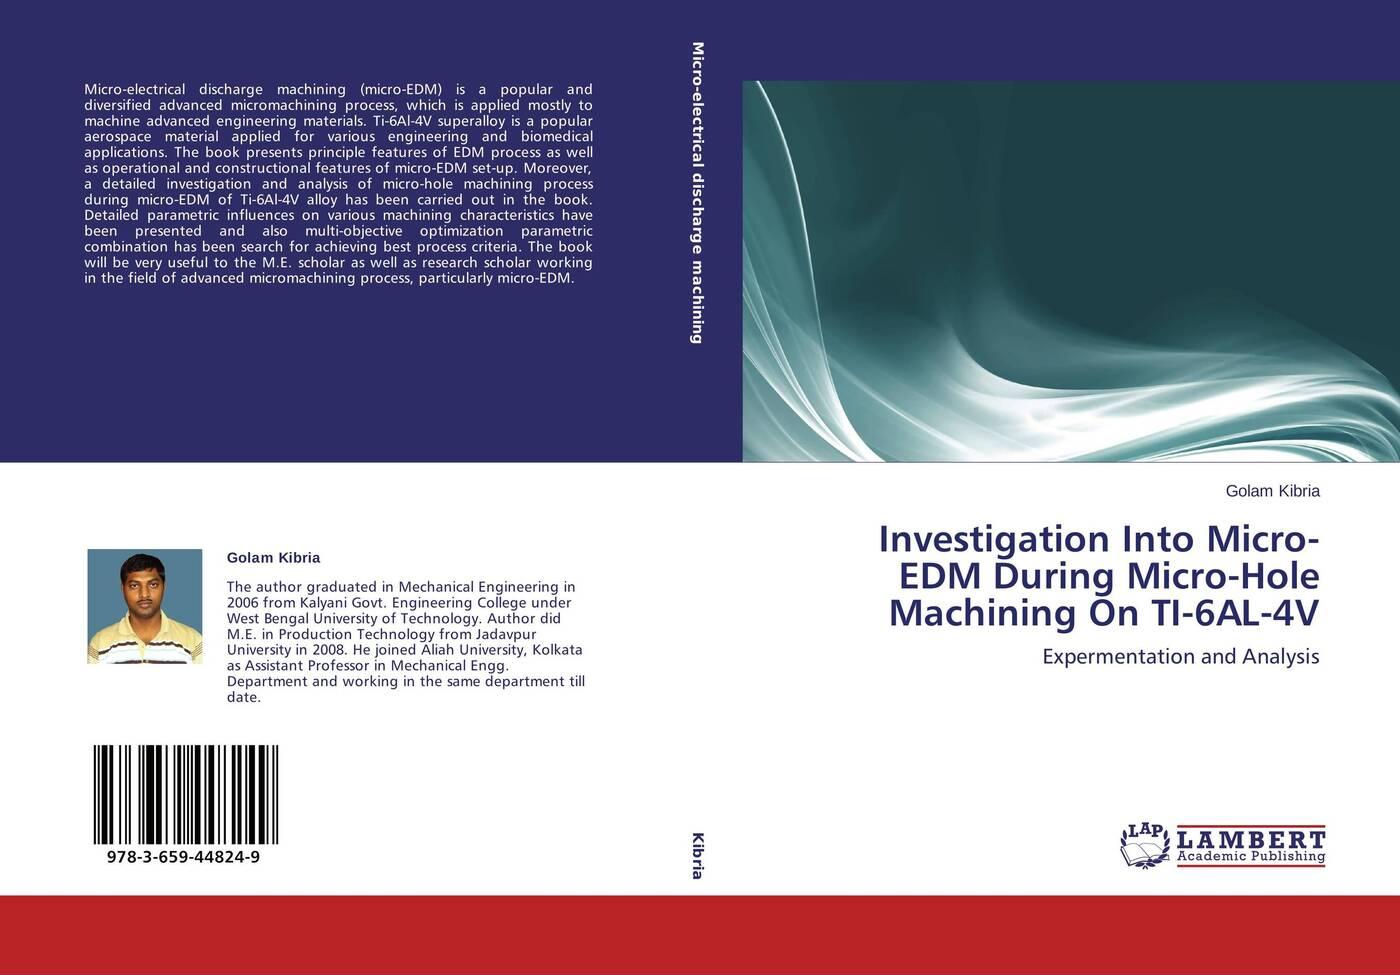 Golam Kibria Investigation Into Micro-EDM During Micro-Hole Machining On TI-6AL-4V improved machinability of titanium alloy ti 6al 4v